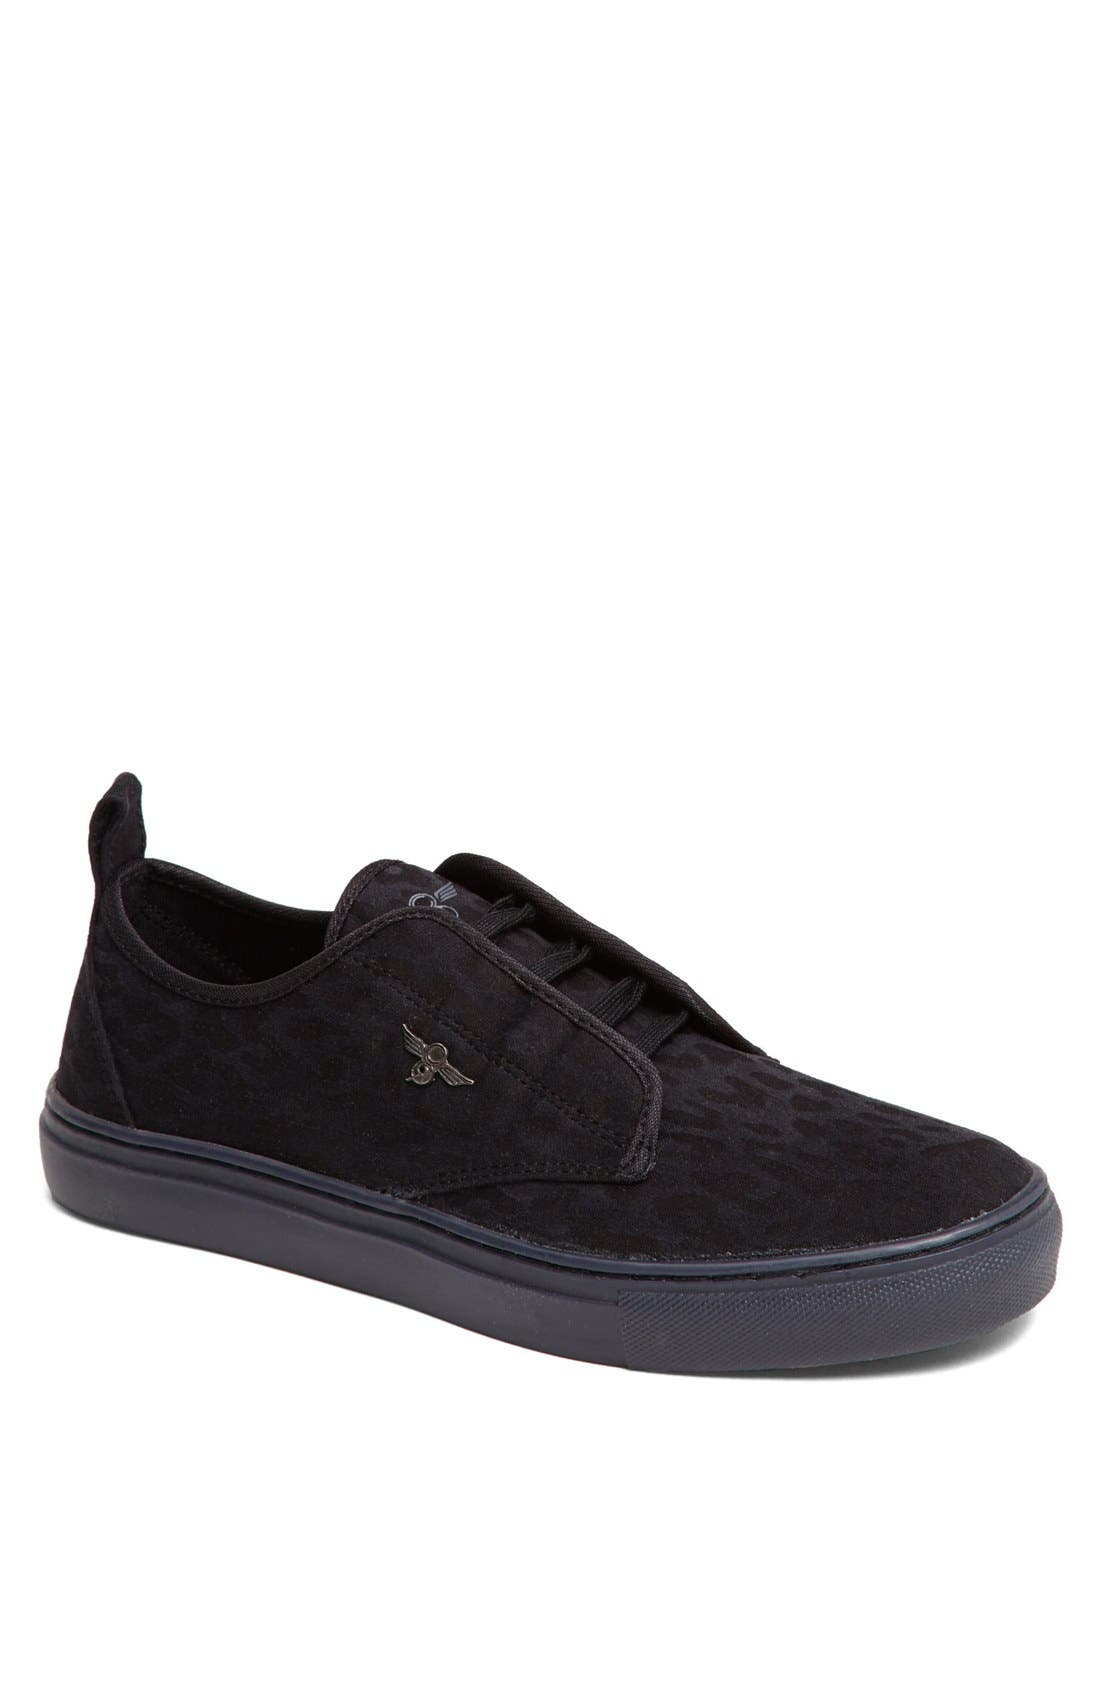 Main Image - Creative Recreation 'Lacava' Sneaker